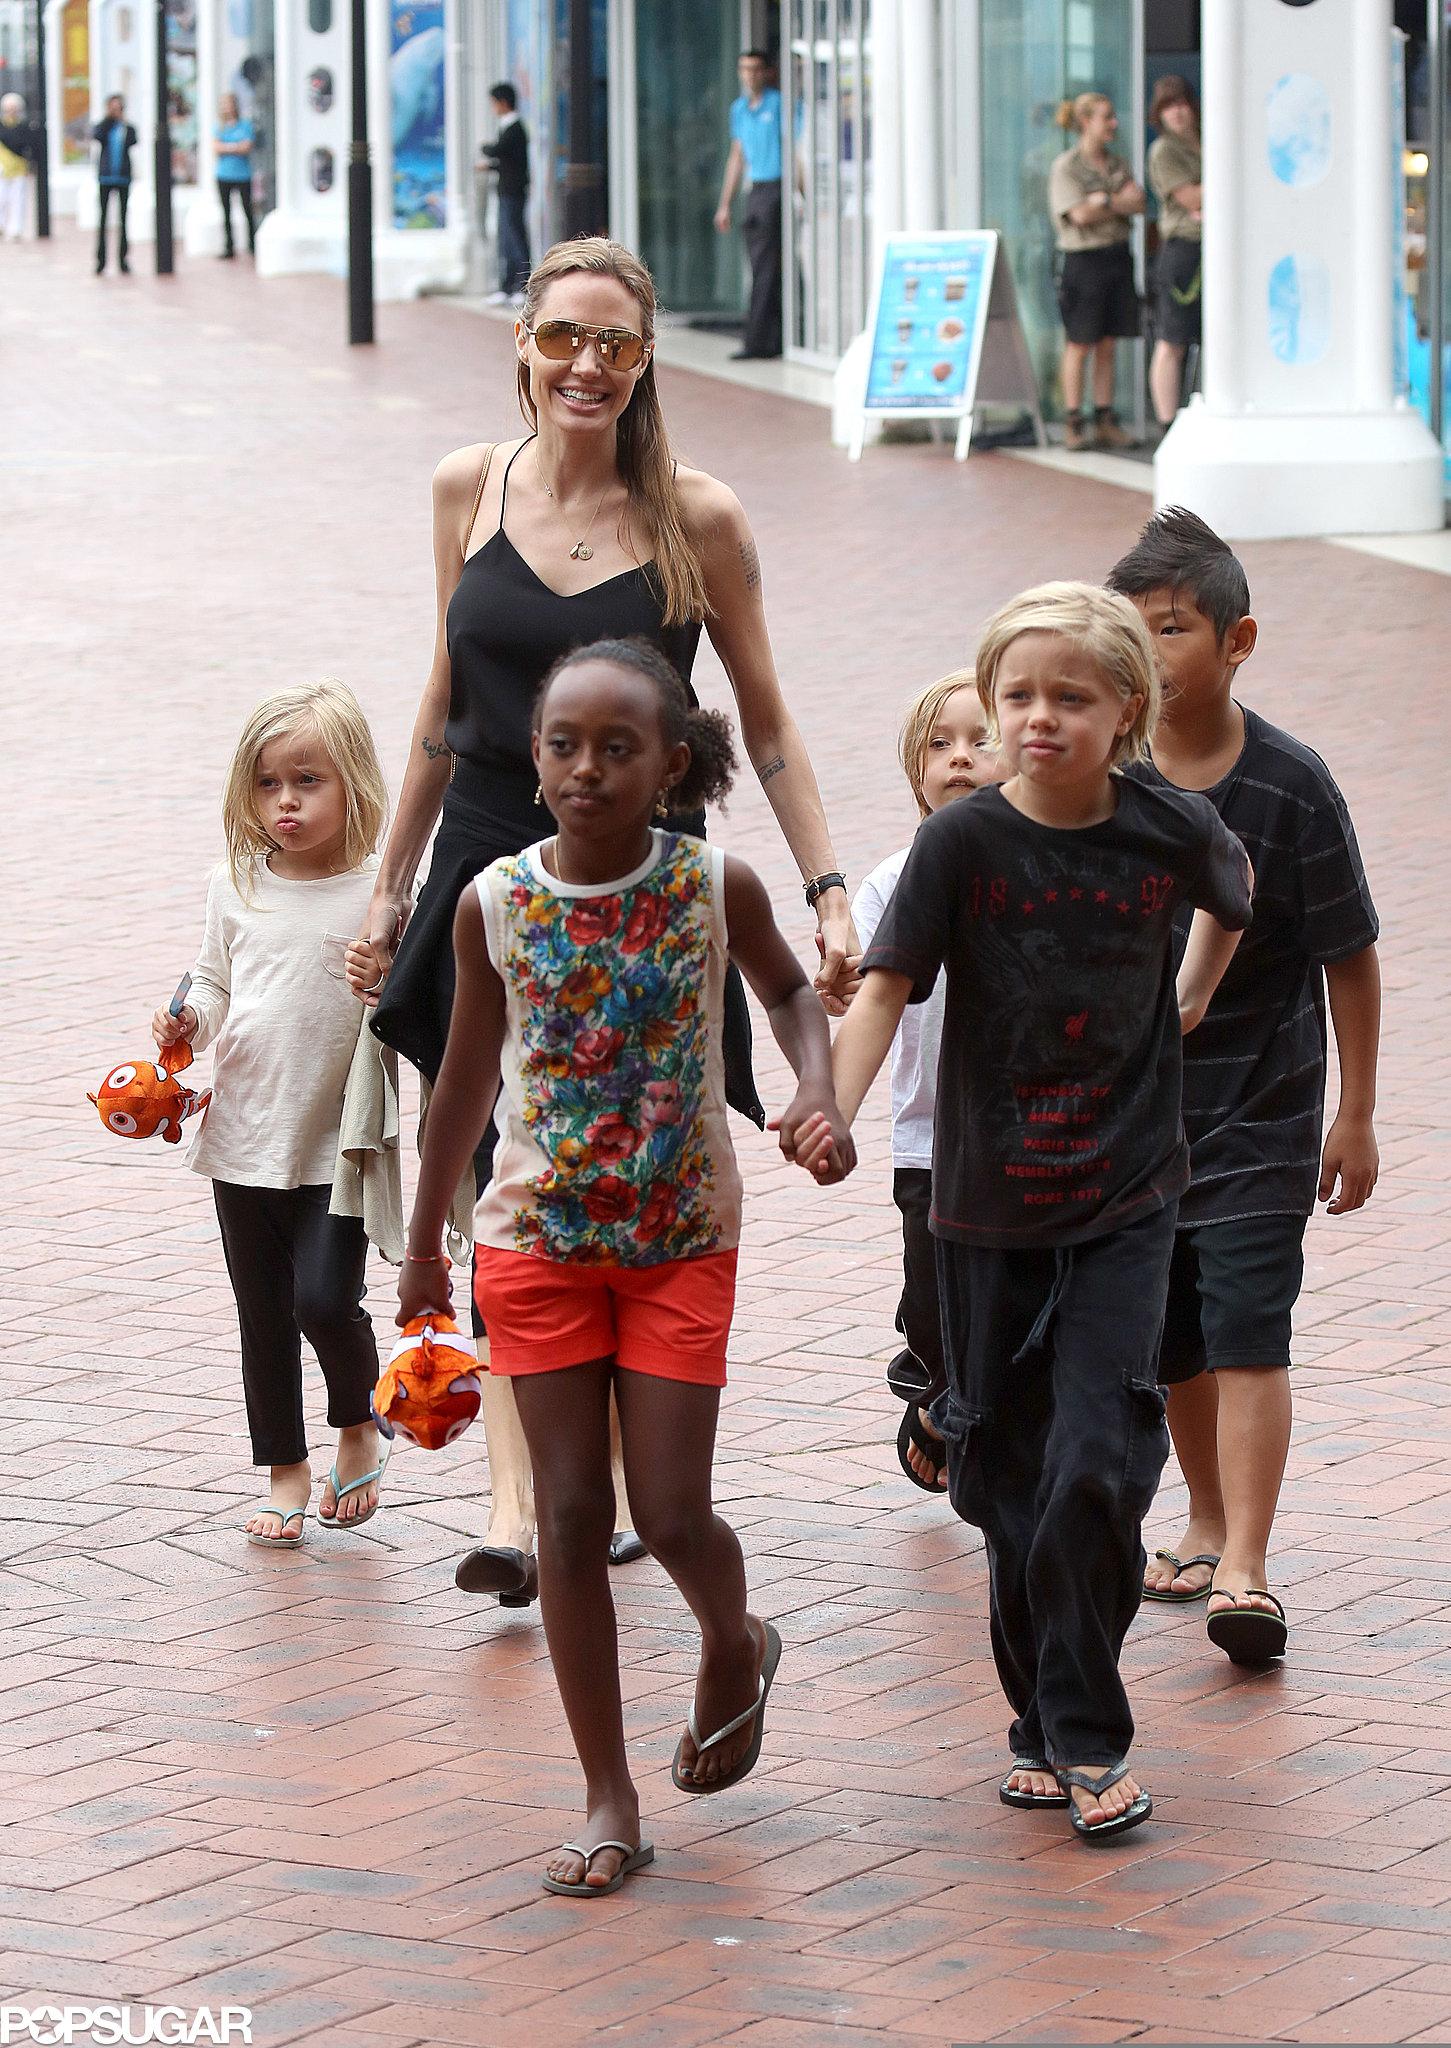 Angelina Jolie and her kids — Shiloh, Zahara, Vivienne, Pax, and Knox — took a trip to the Sea Life Sydney Aquarium in Australia.